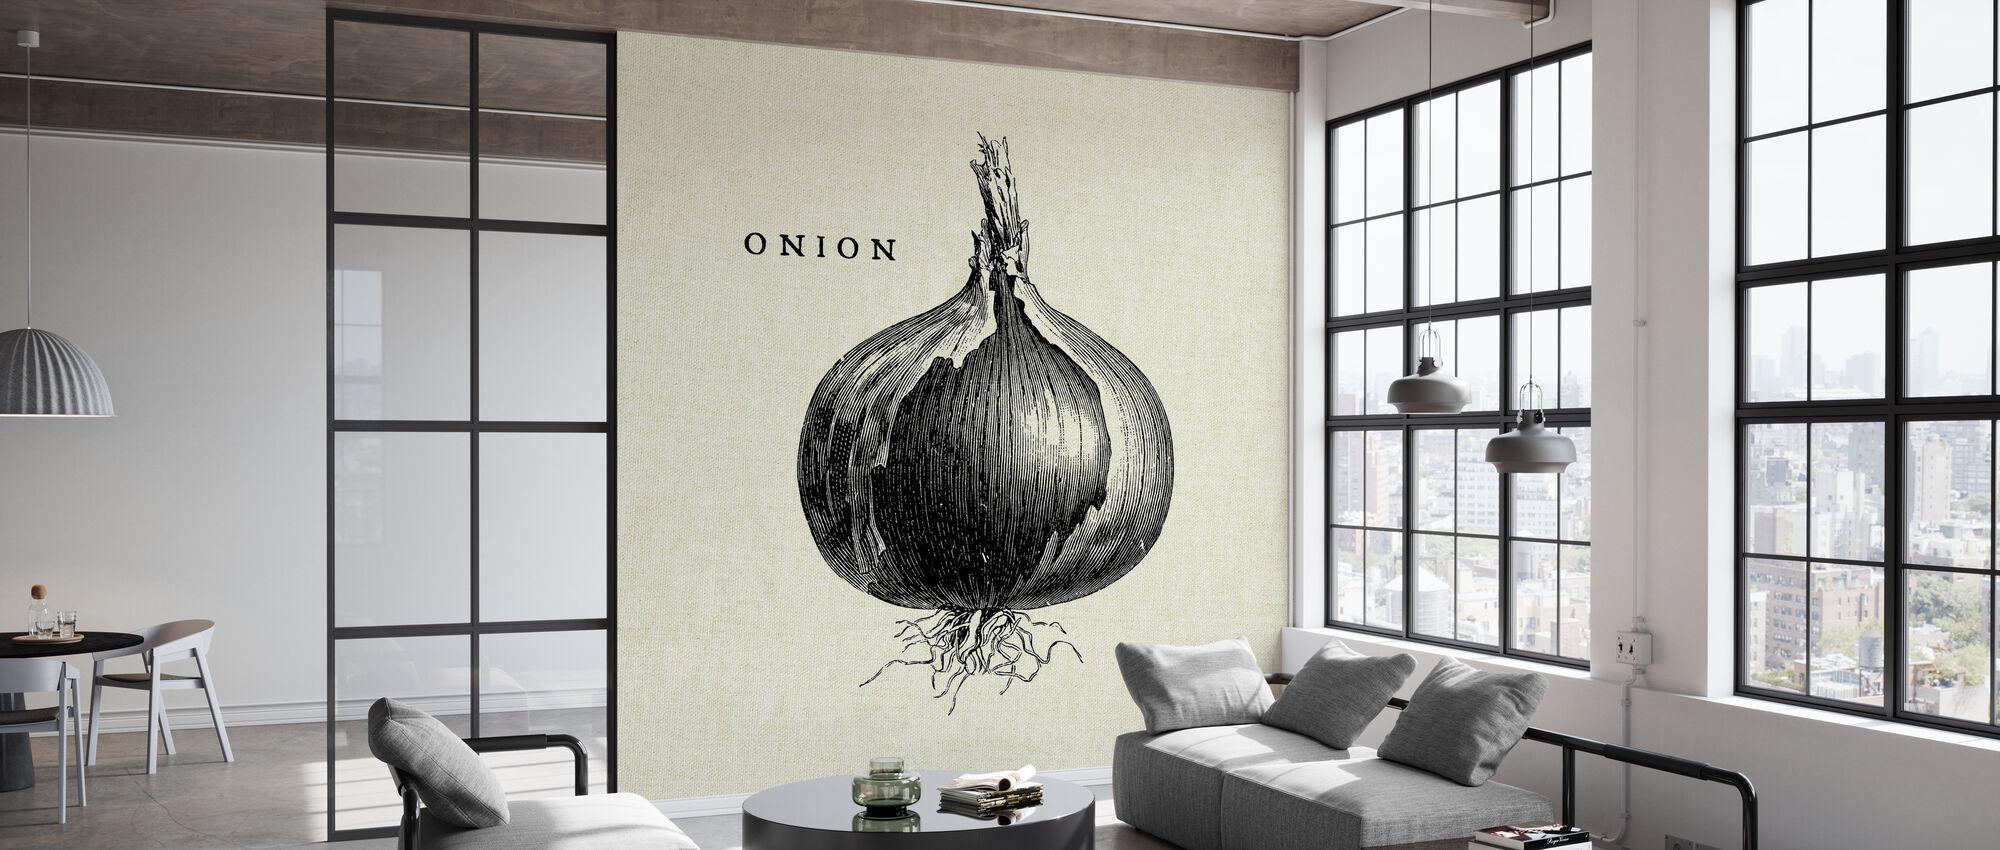 Küche Illustration - Zwiebel - Tapete - Büro